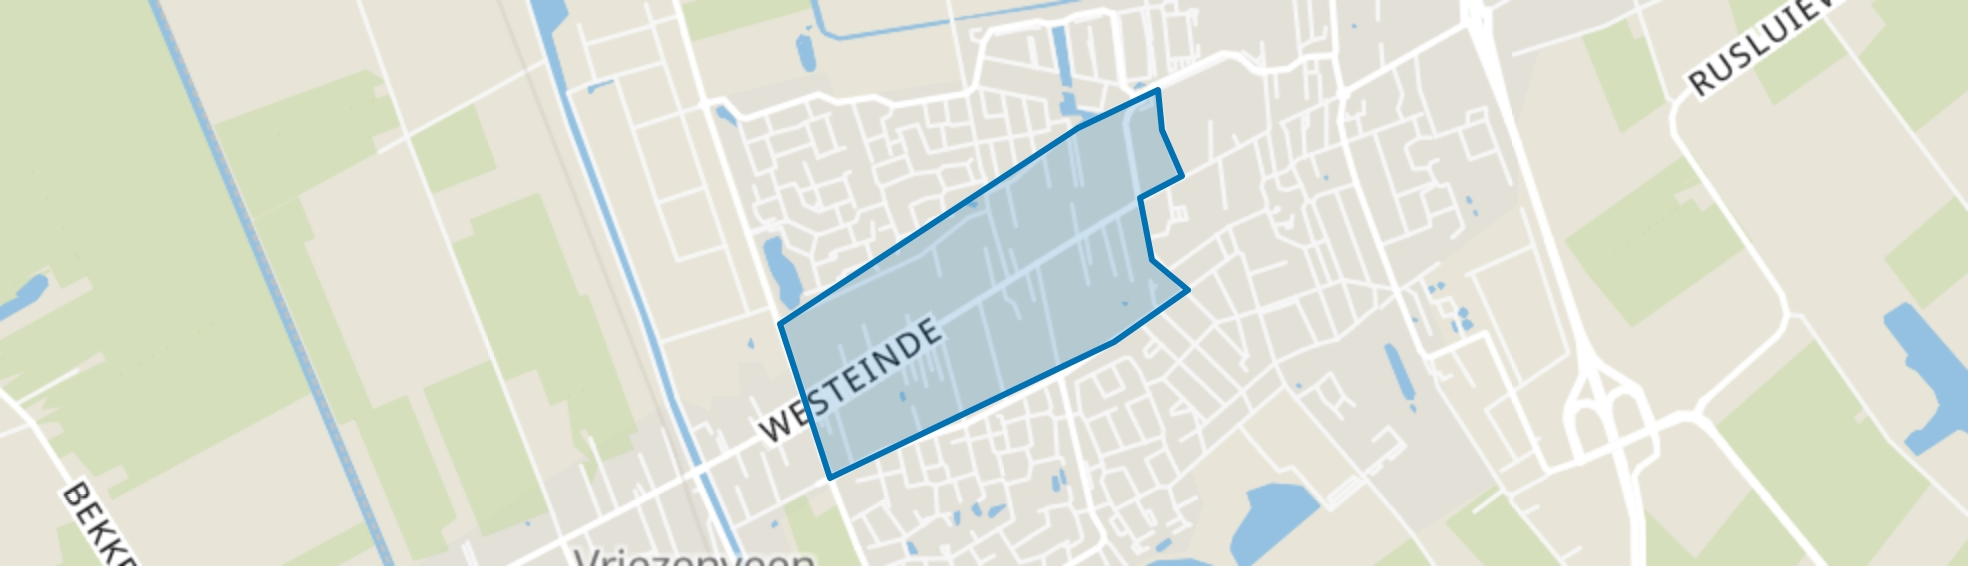 Westeinde, Vriezenveen map